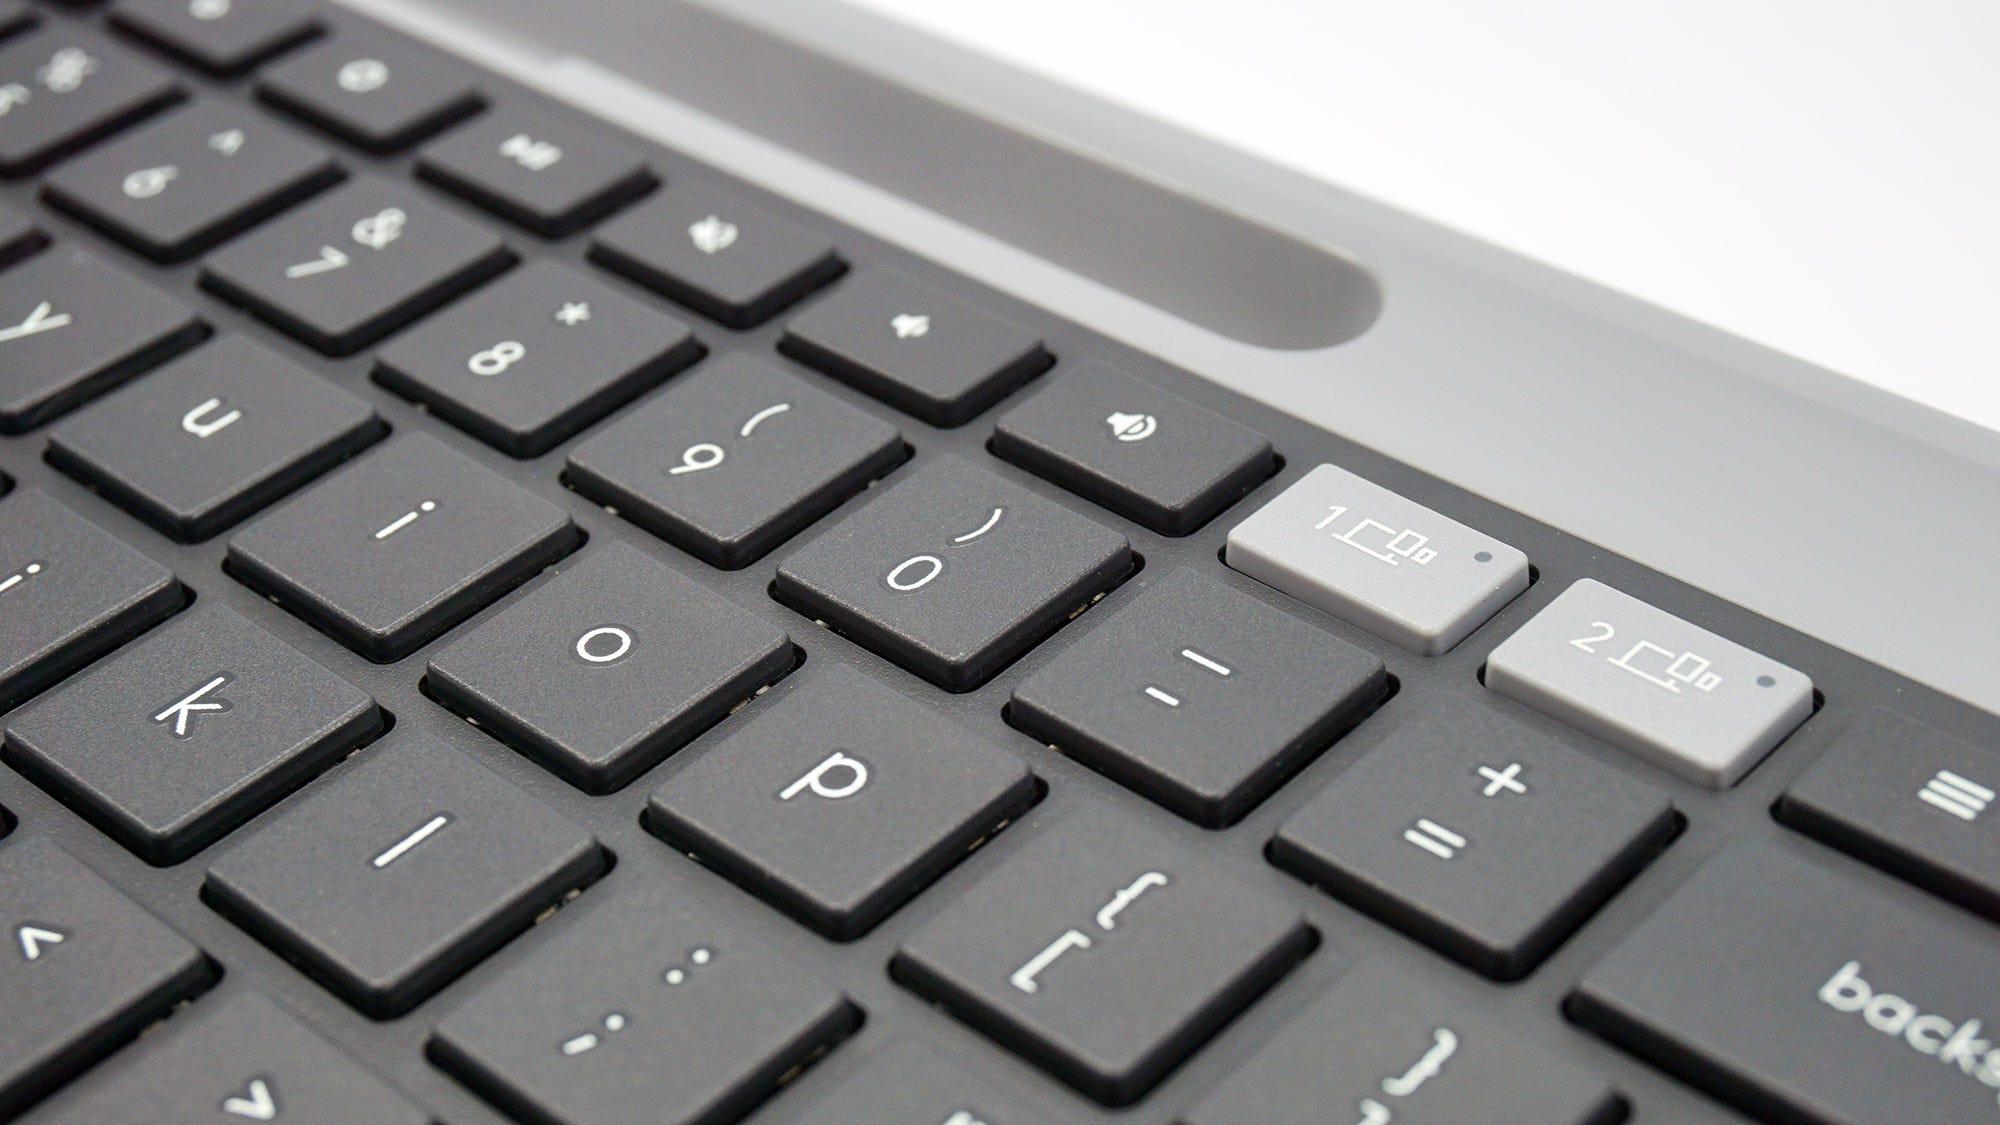 A closeup of the keys on the Logitech K580 keyboard.